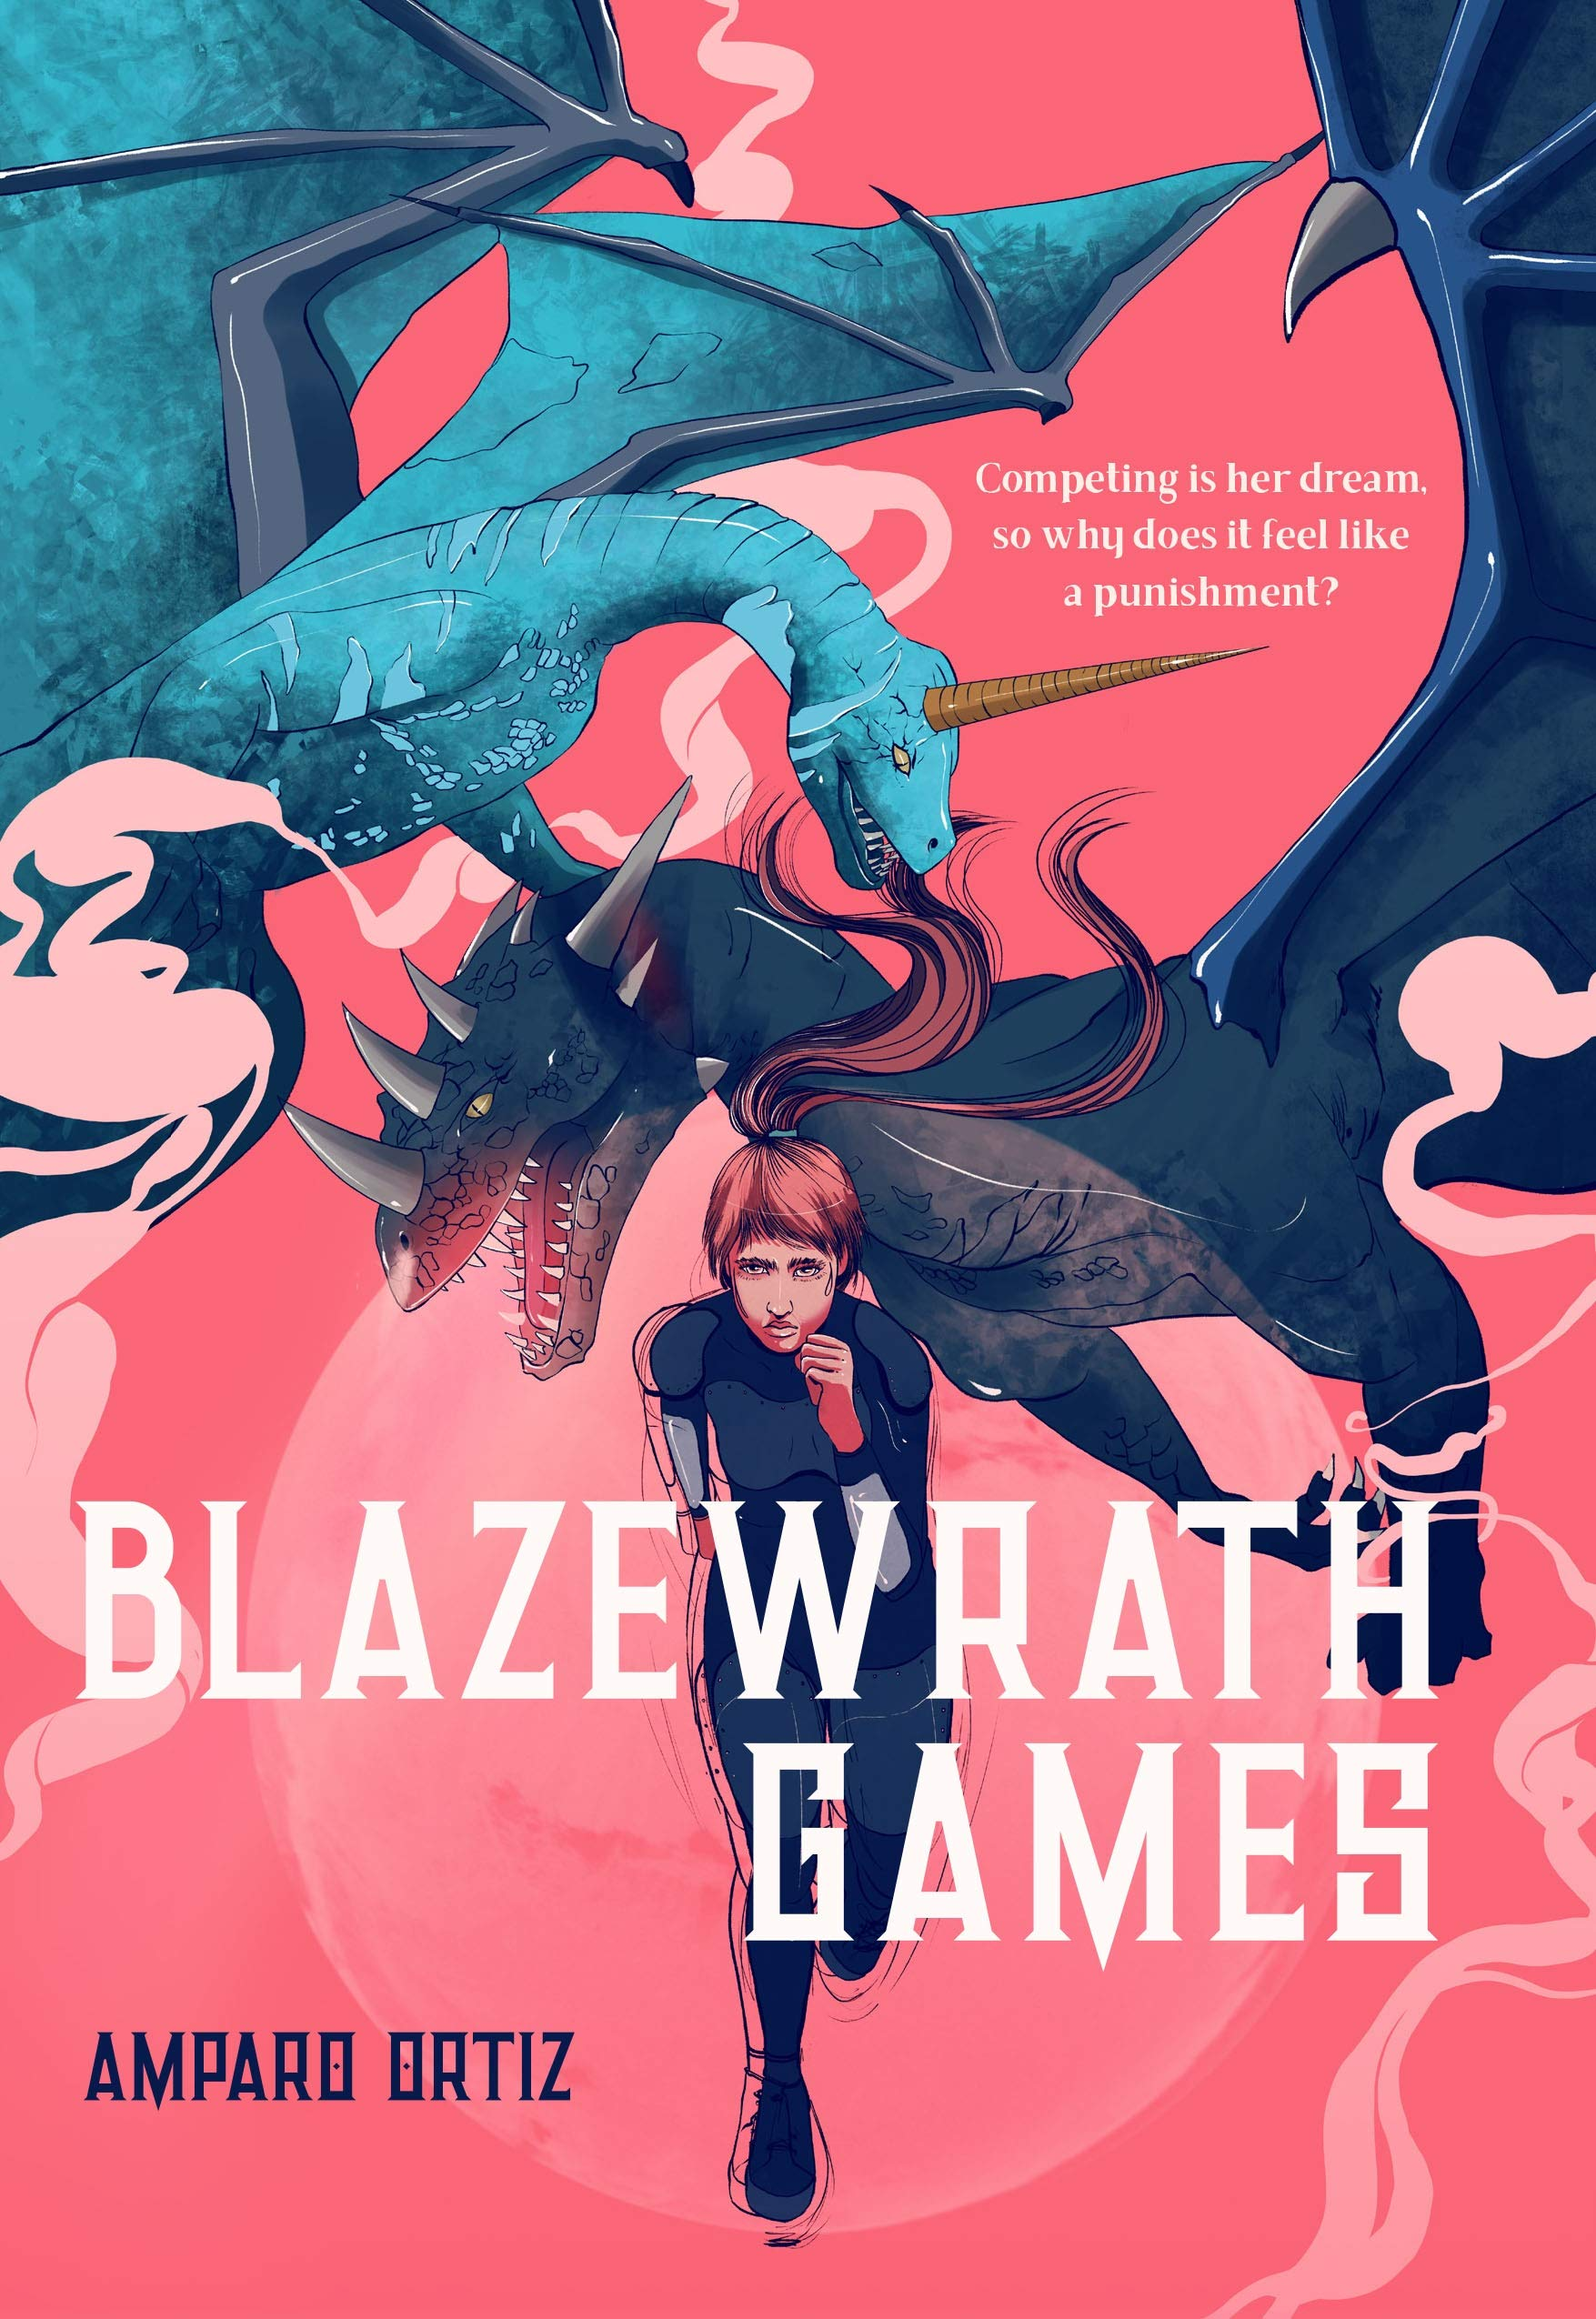 Amazon.com: Blazewrath Games (9781645670797): Ortiz, Amparo: Books